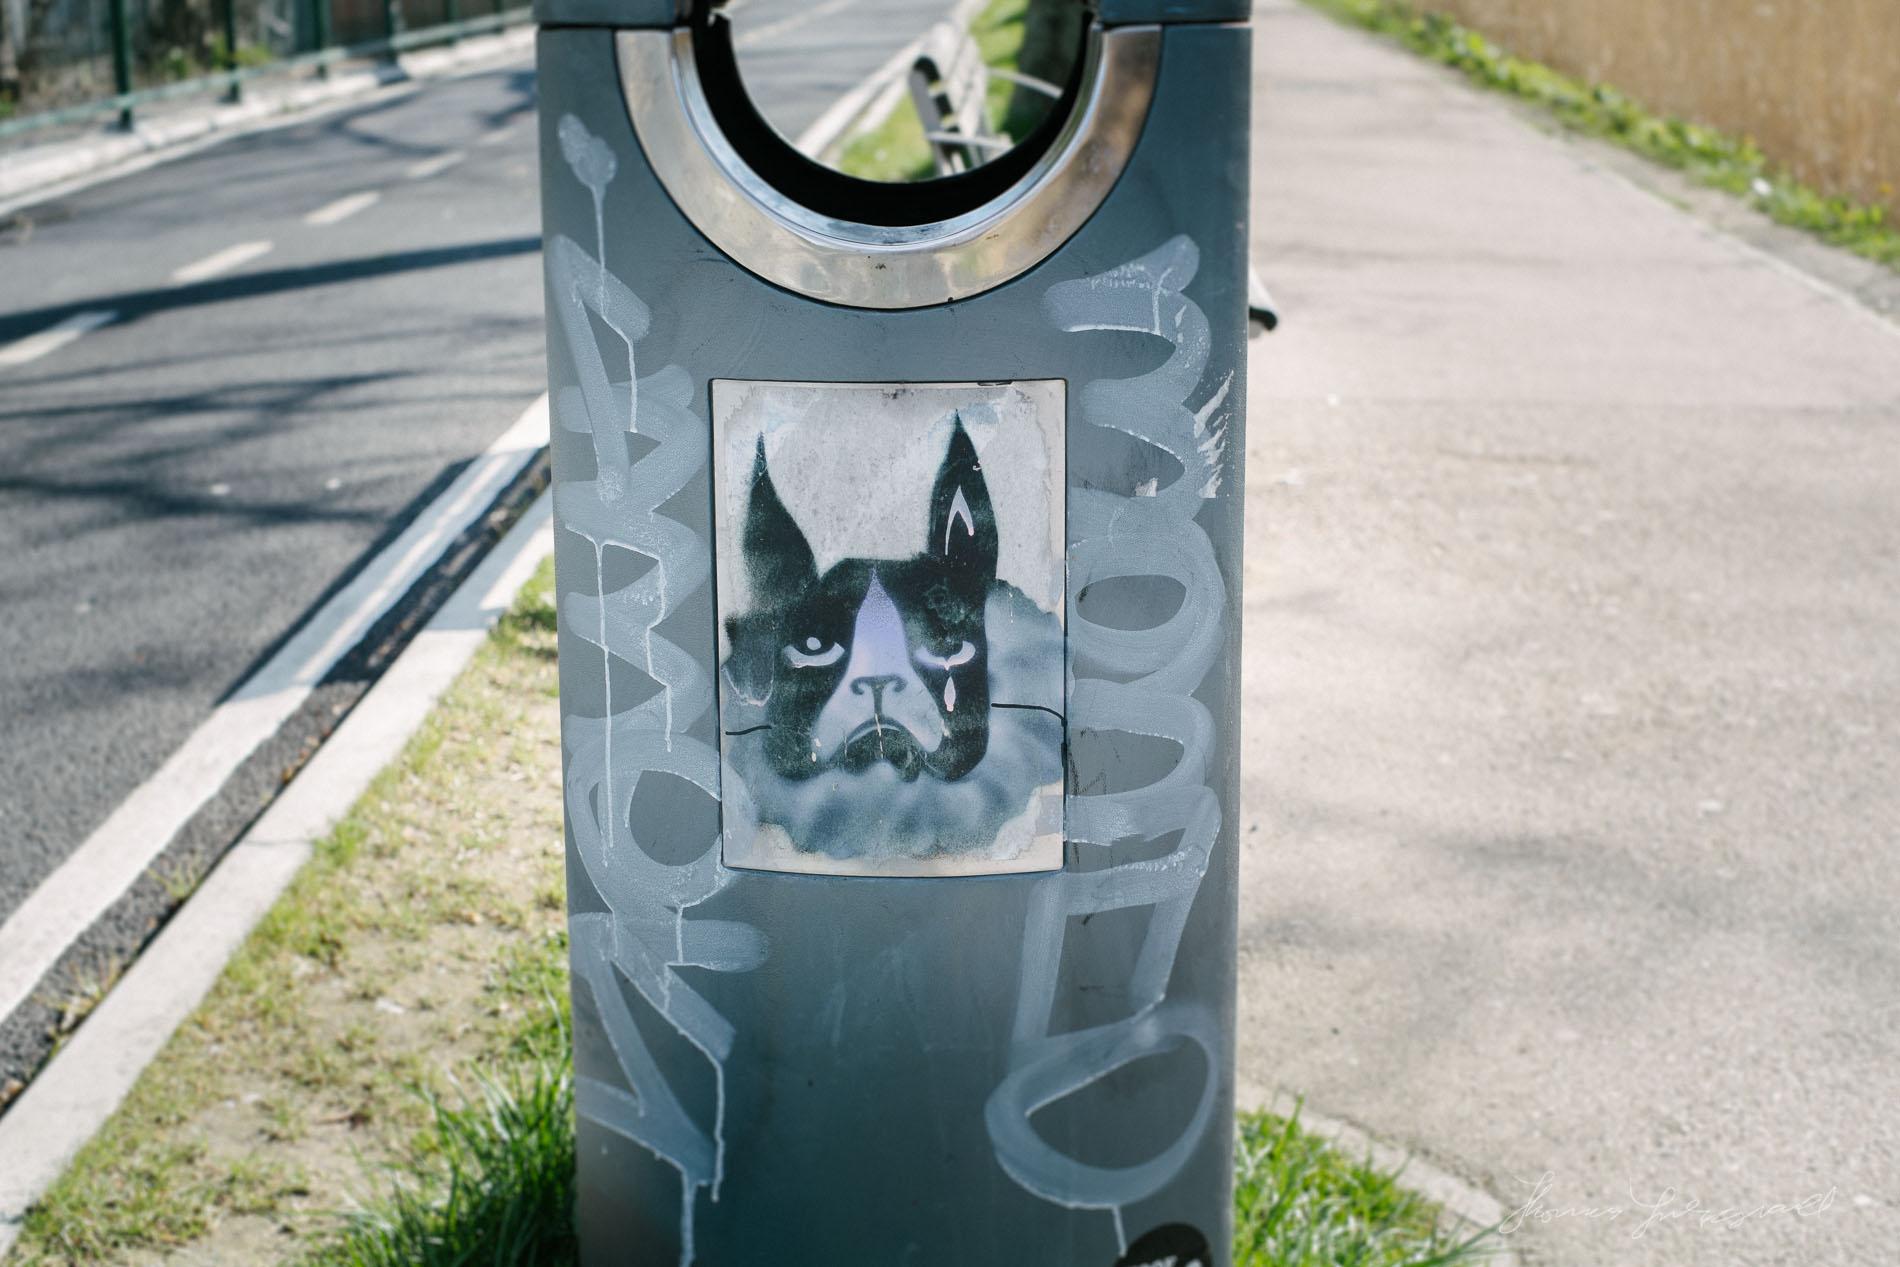 Dog Street Art - Fuji XE-1